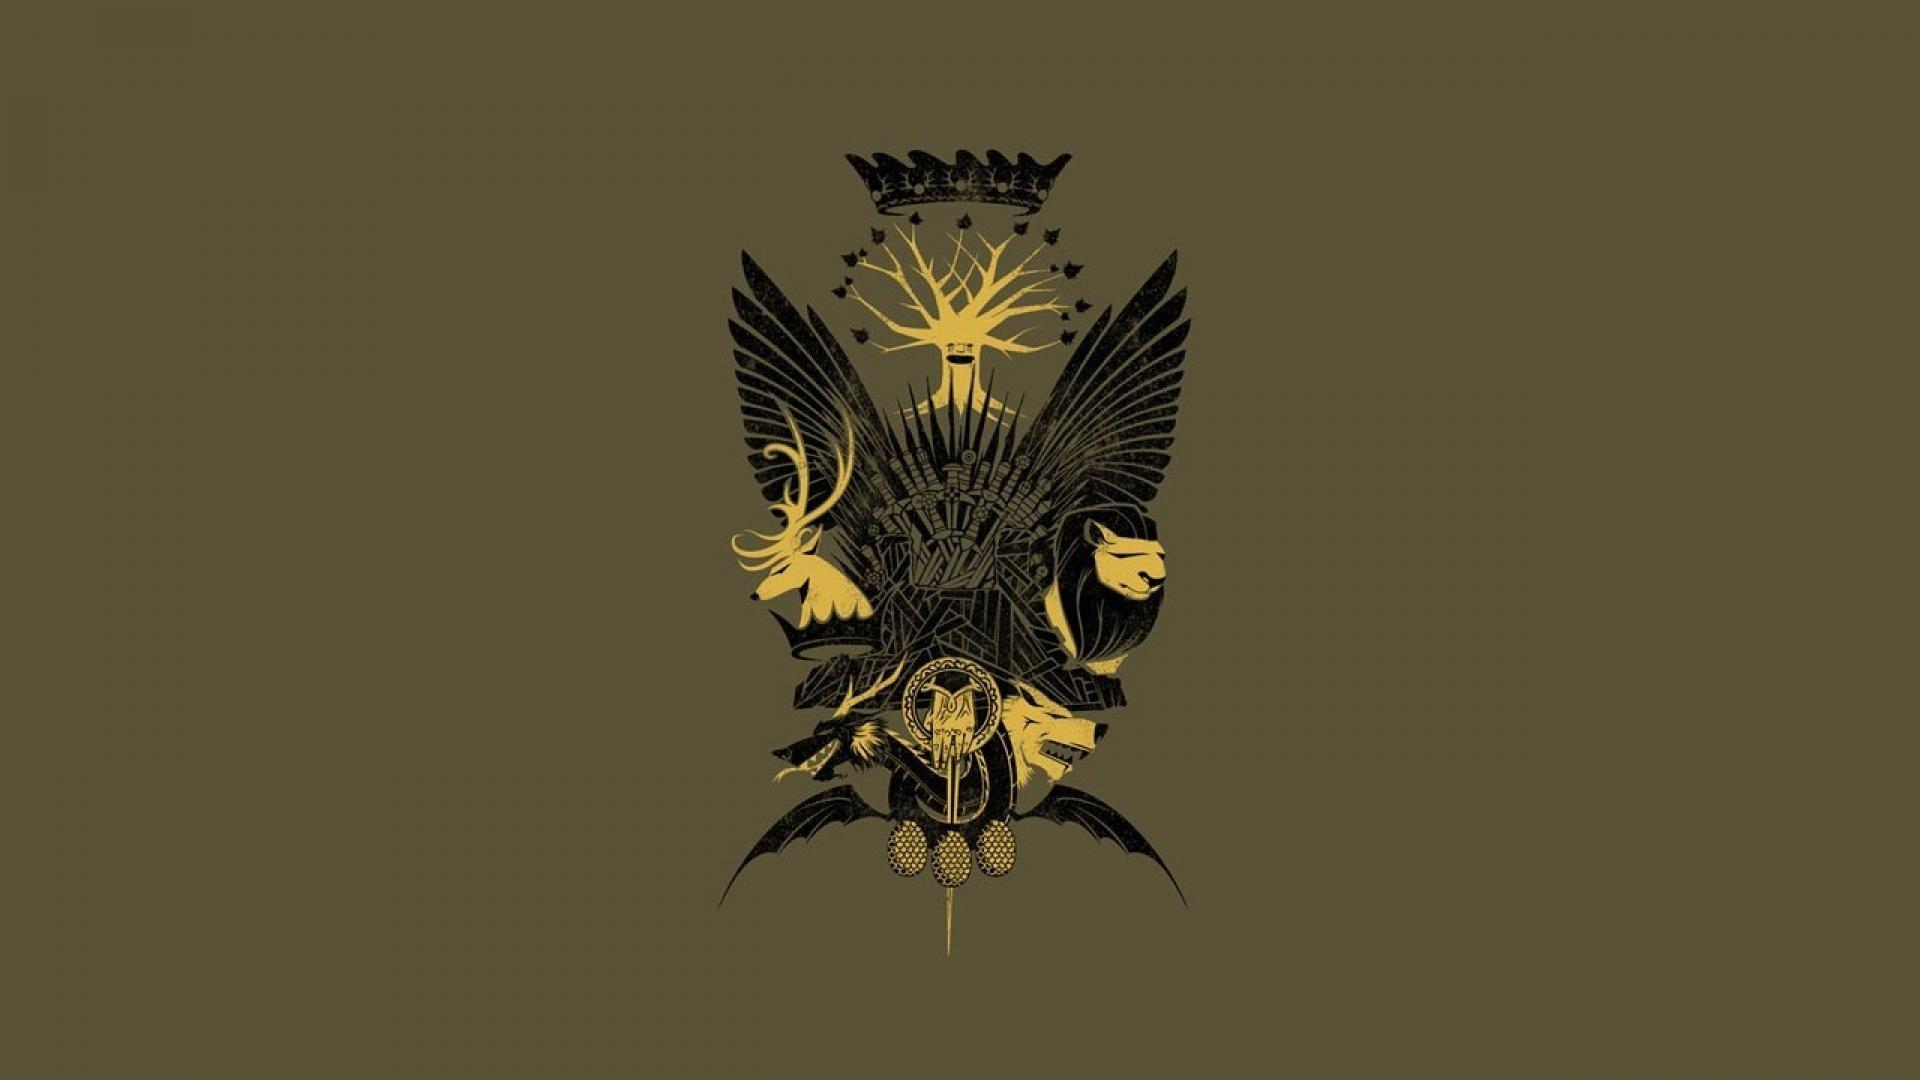 Houses game of thrones house lannister stark seal wallpaper | (49250)